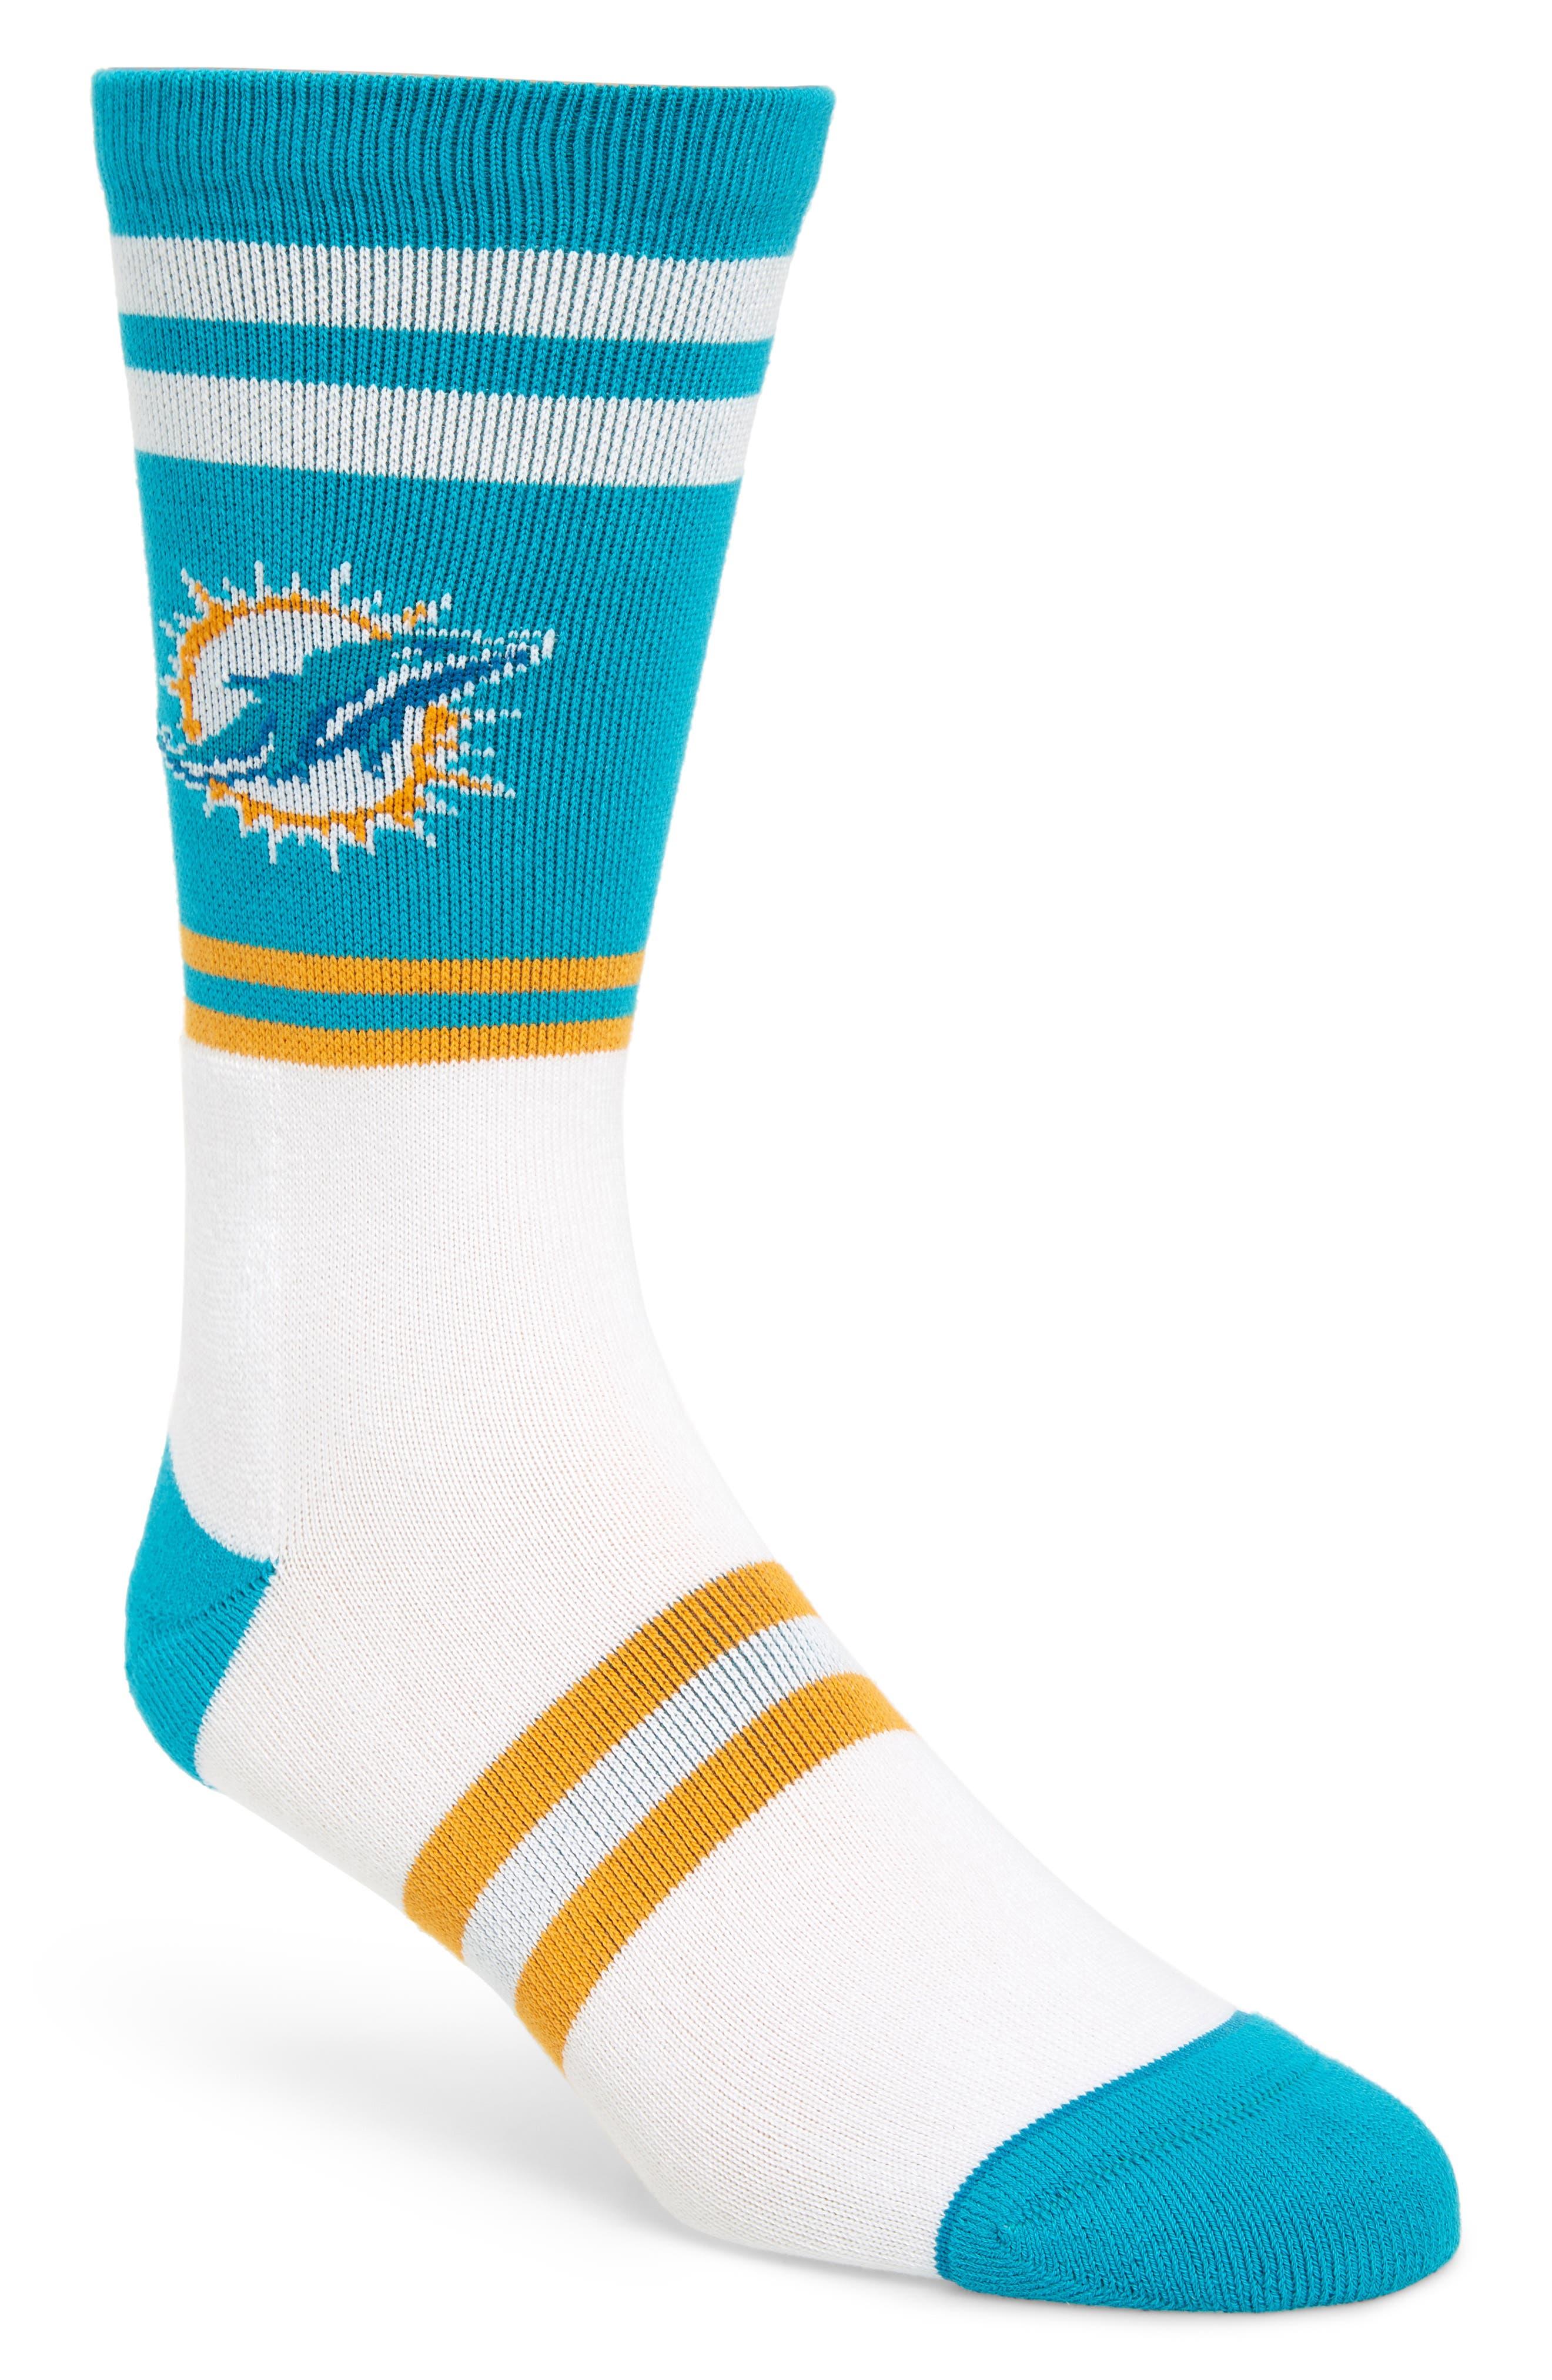 Miami Dolphins Socks,                         Main,                         color, 440